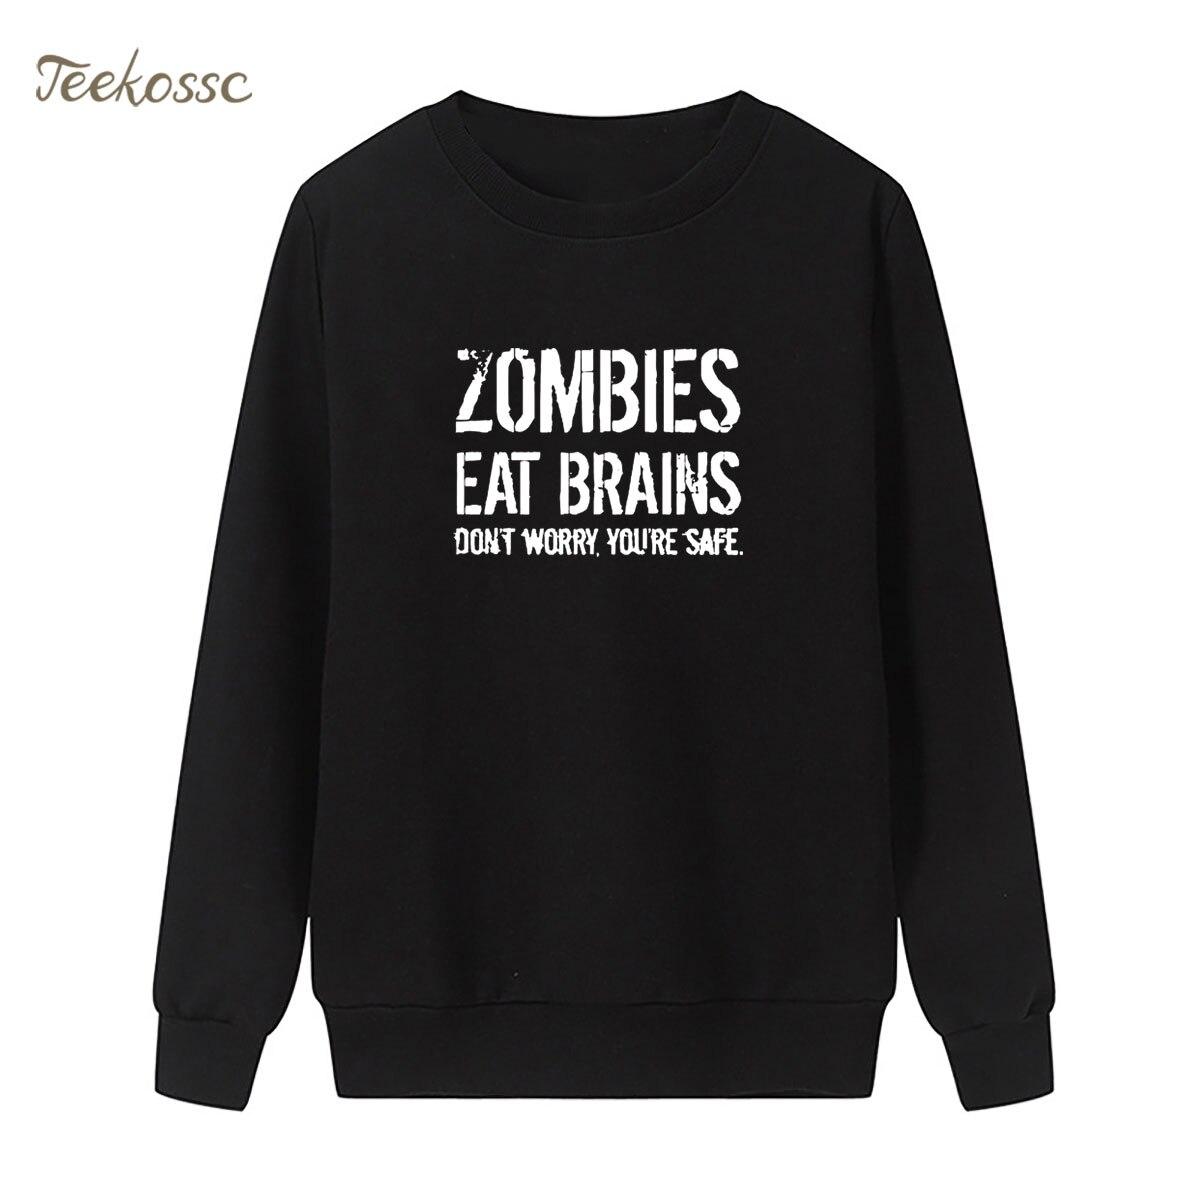 Zombies Eat Brains-So You're Safe Sweatshirt Funny Print Hoodie Winter Autumn Women Lasdies Pullover Loose Fleece Streetwear